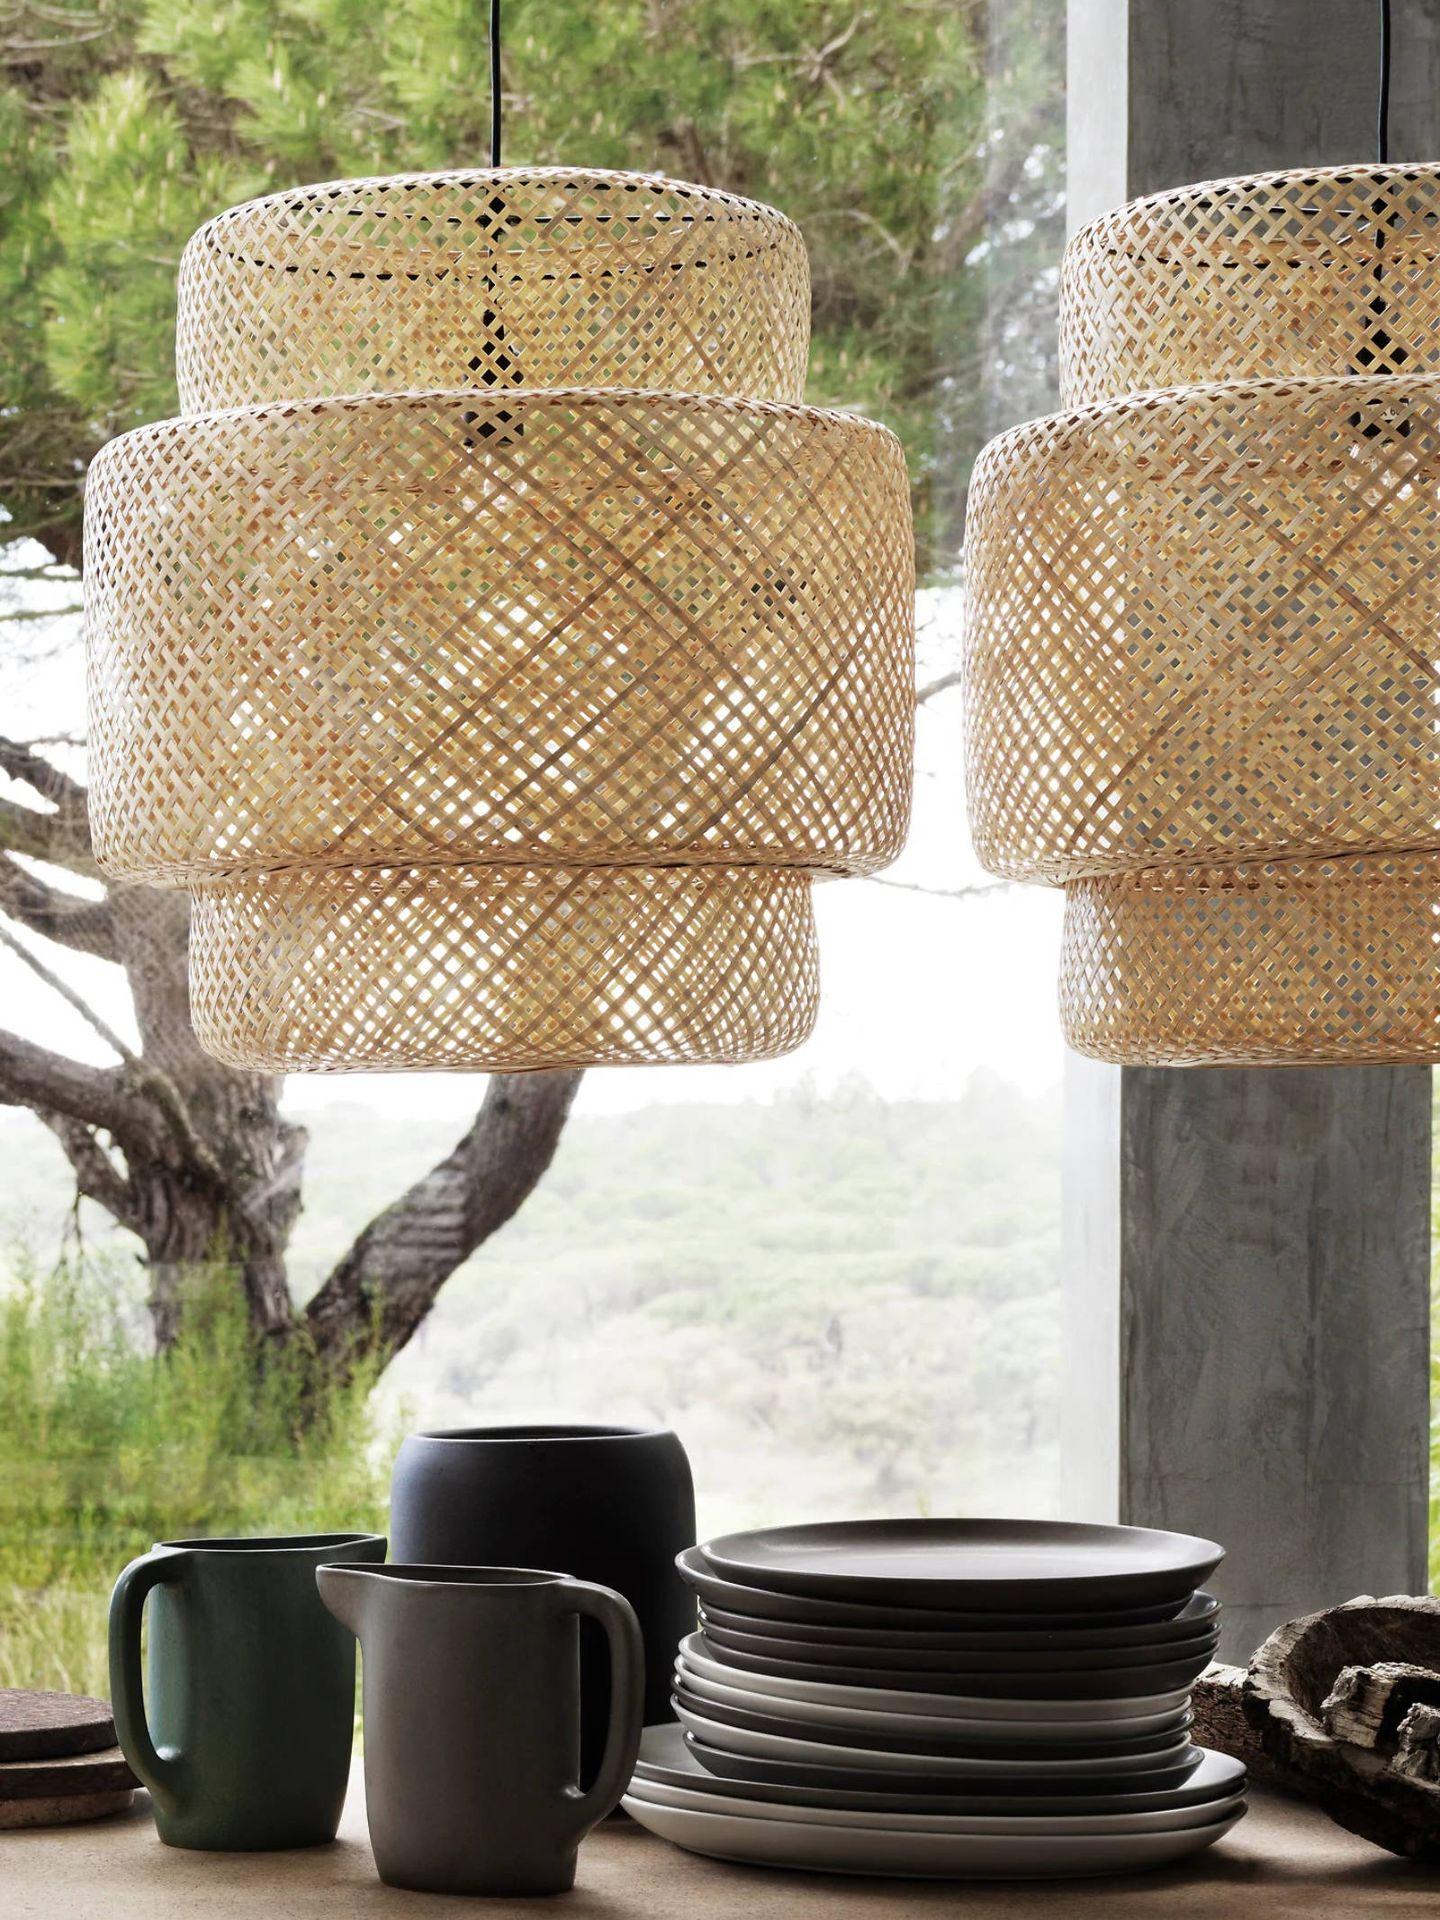 Lámpara de bambú de Ikea. (Cortesía)